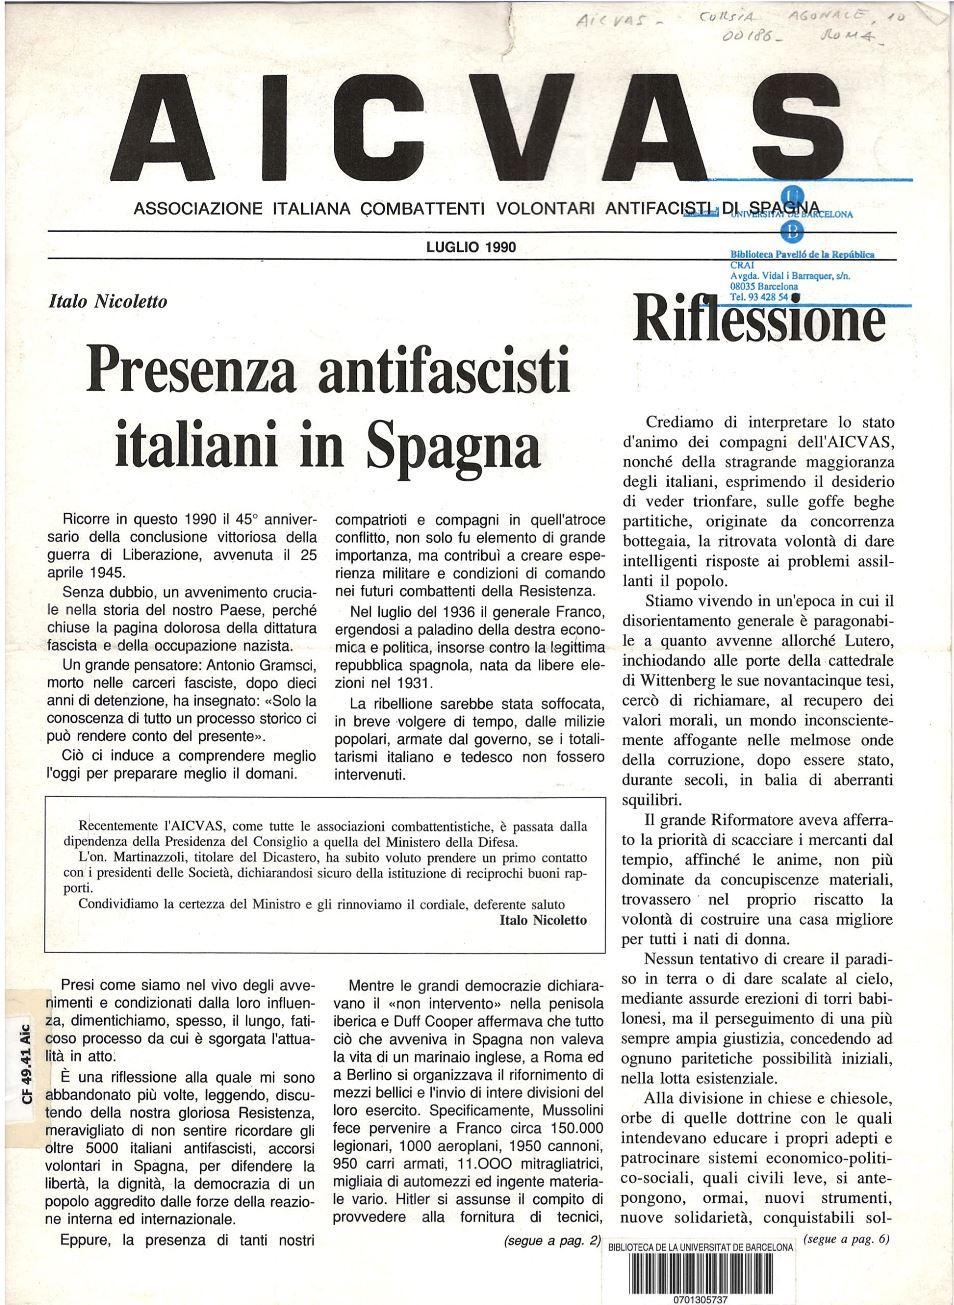 AICVAS : Associazione italiana combattenti volontari antifascisti di Spagna